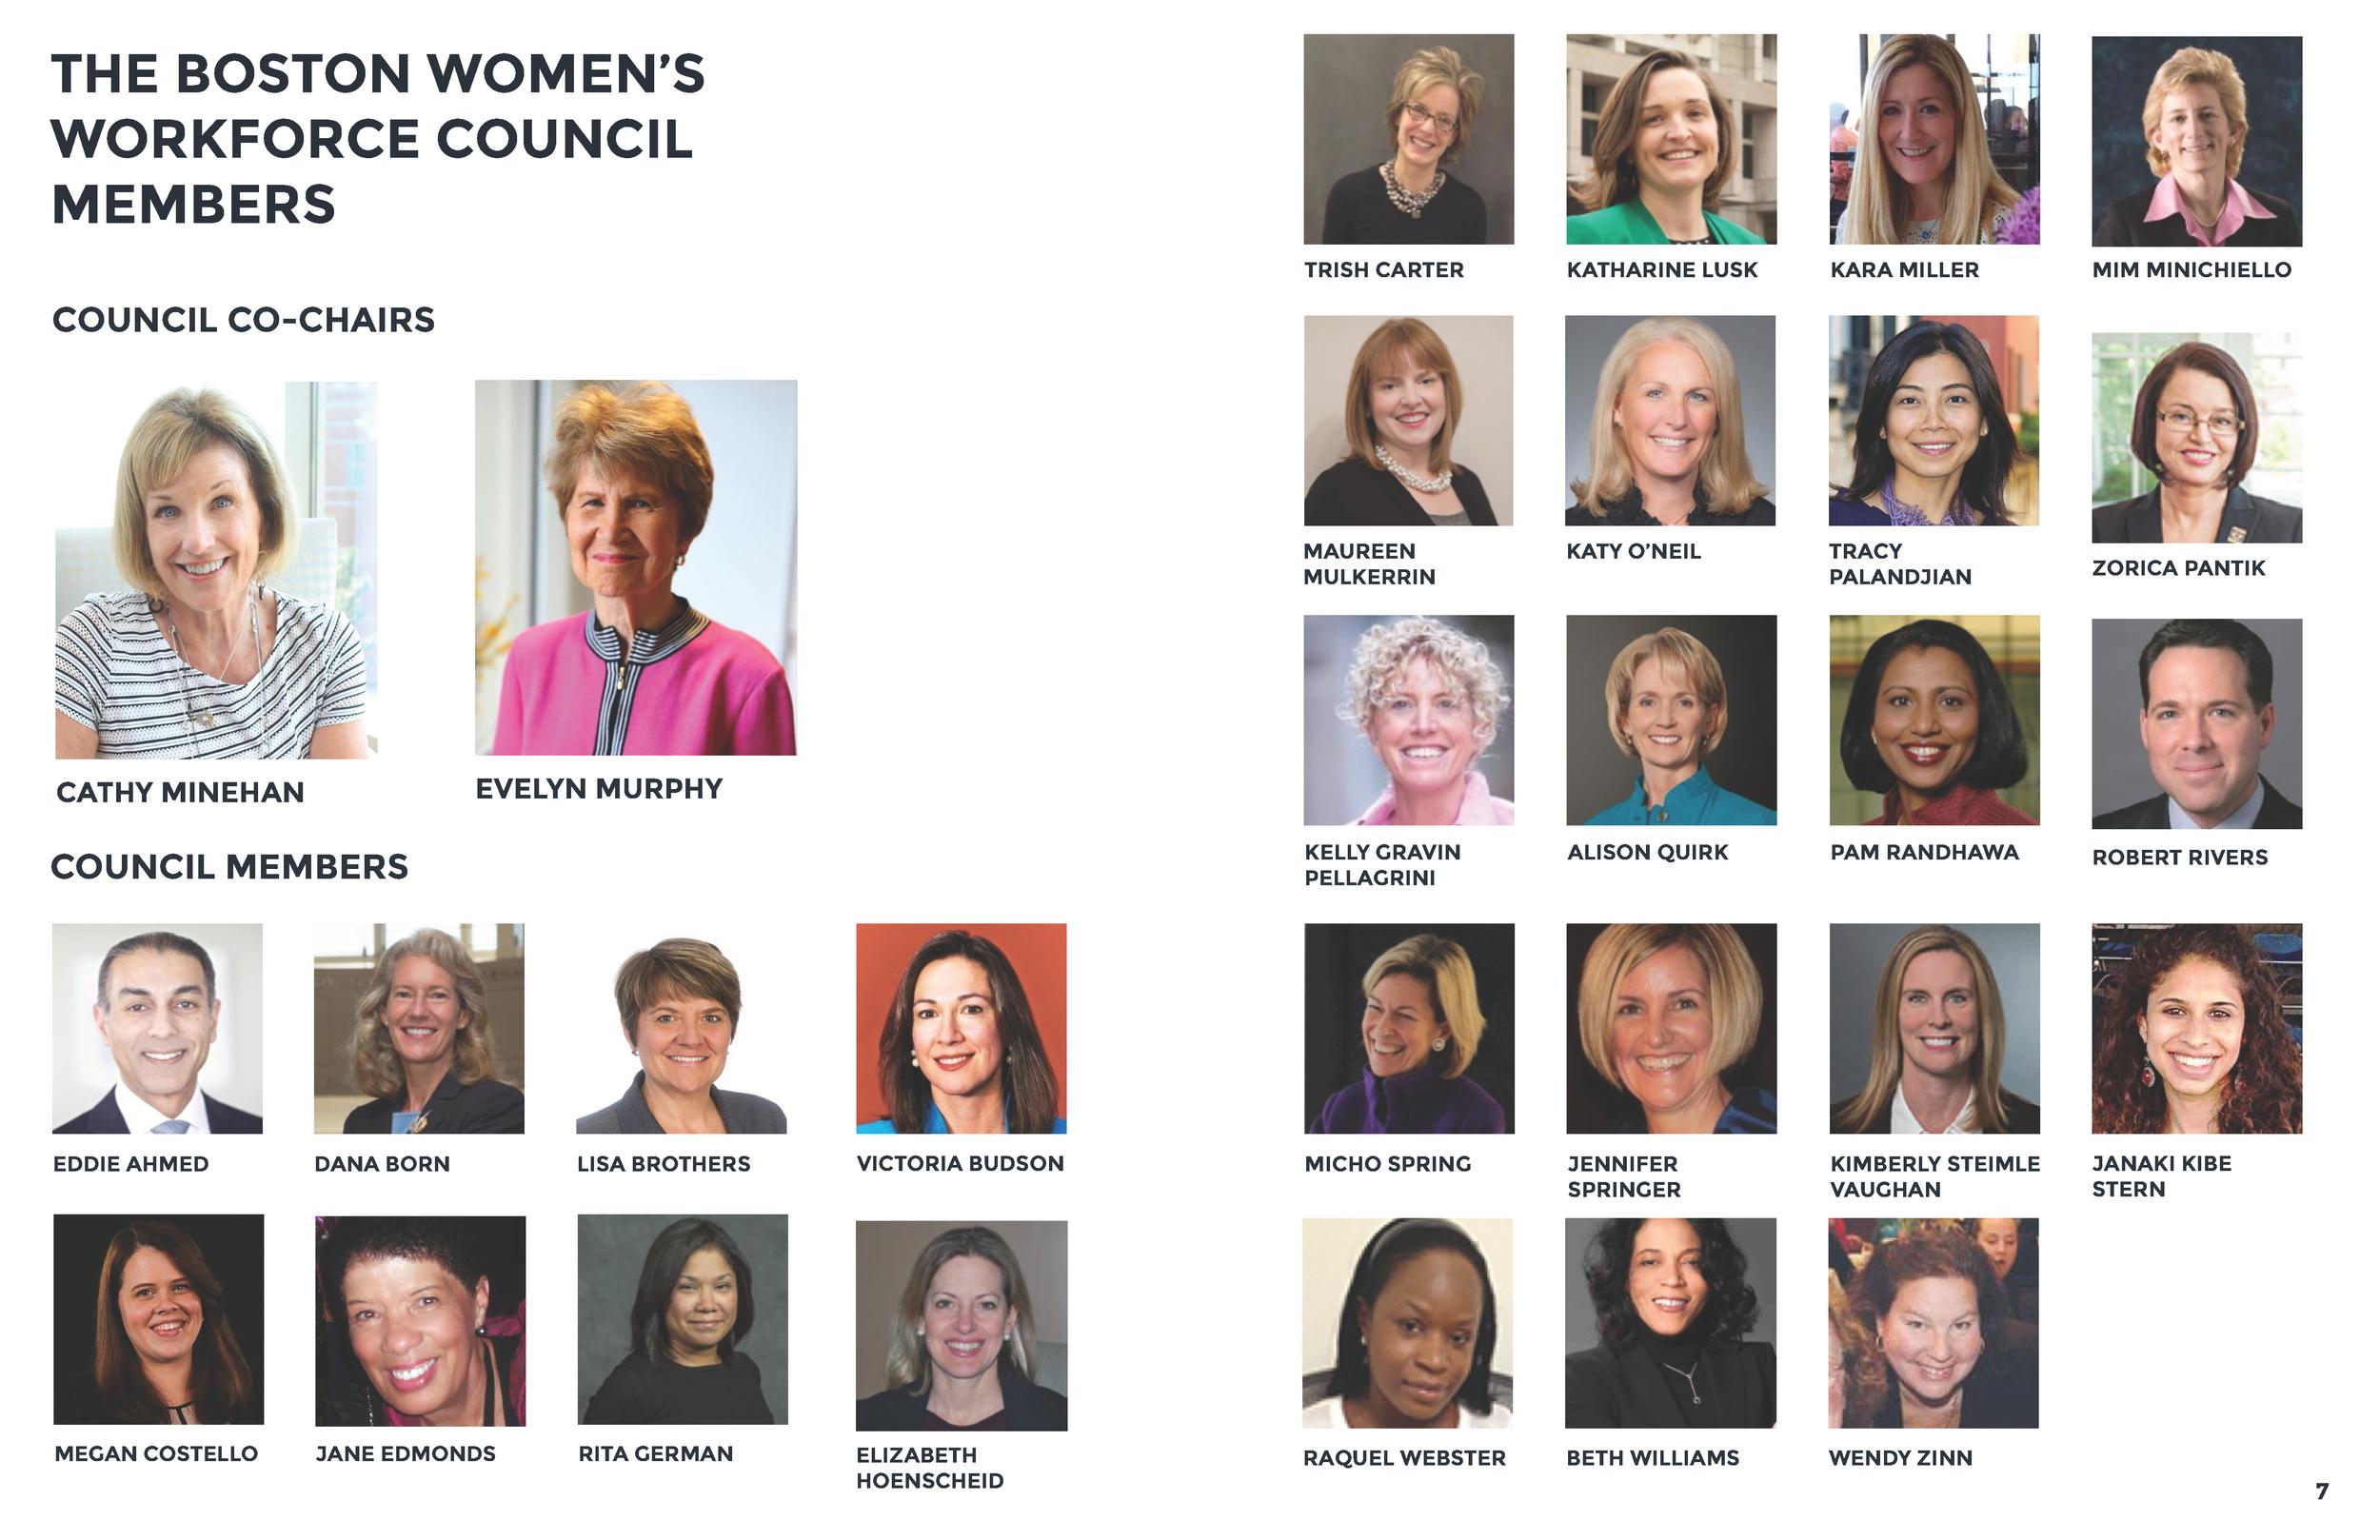 BostonWomen'sWorkforceCouncilReport2016_Page_04.png